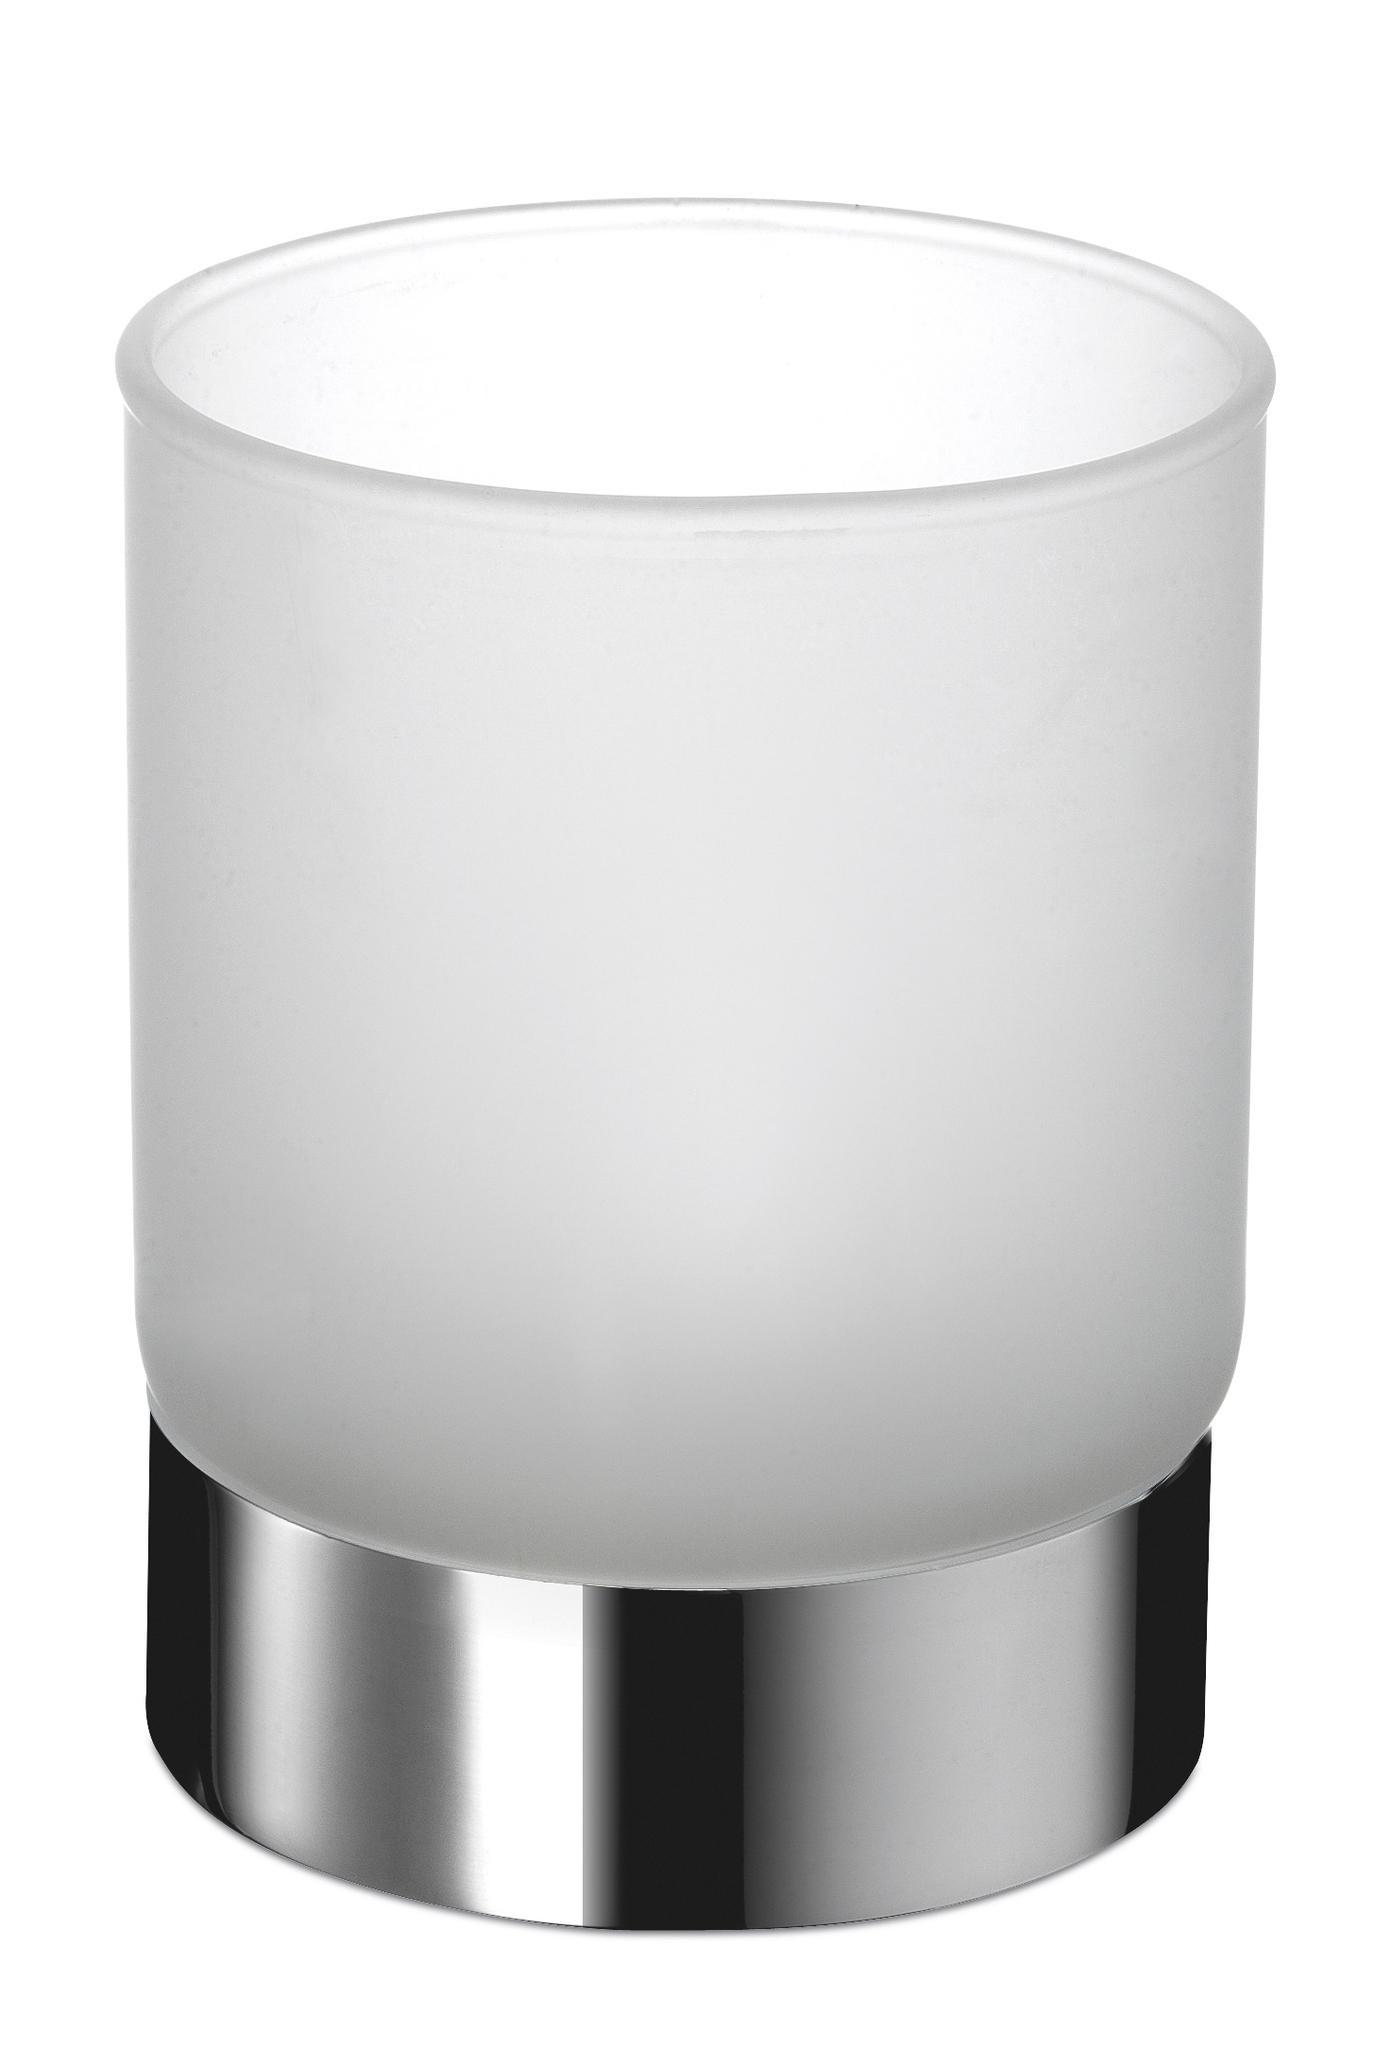 Стаканы для пасты Стакан на подставке Windisch 94124MCR Frozen Crystal stakan-na-podstavke-94124-frozen-crystal-ot-windisch-ispaniya.jpg